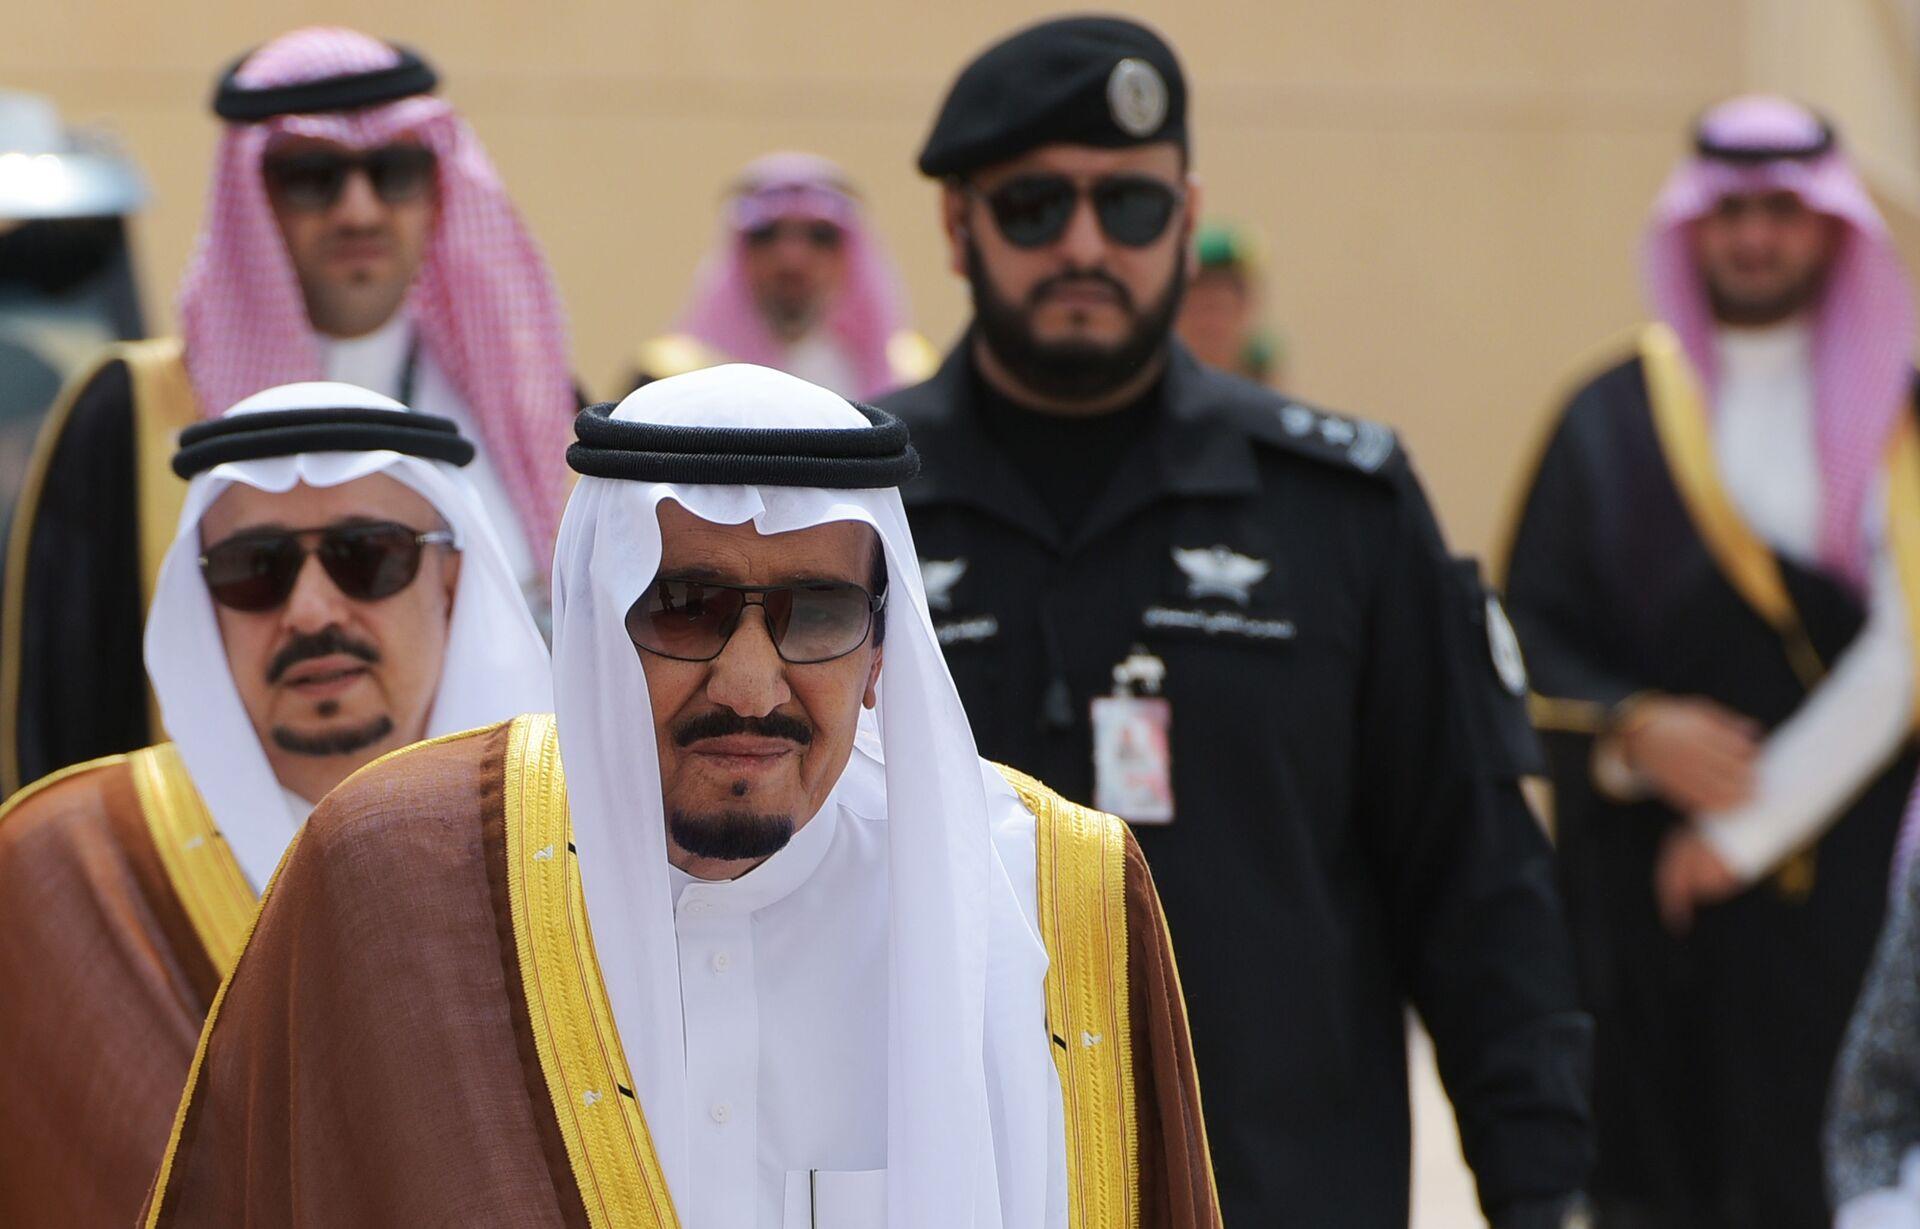 Nhà vua Ả Rập Xê-Út Salman bin Abdulaziz Al Saud - Sputnik Việt Nam, 1920, 05.10.2021